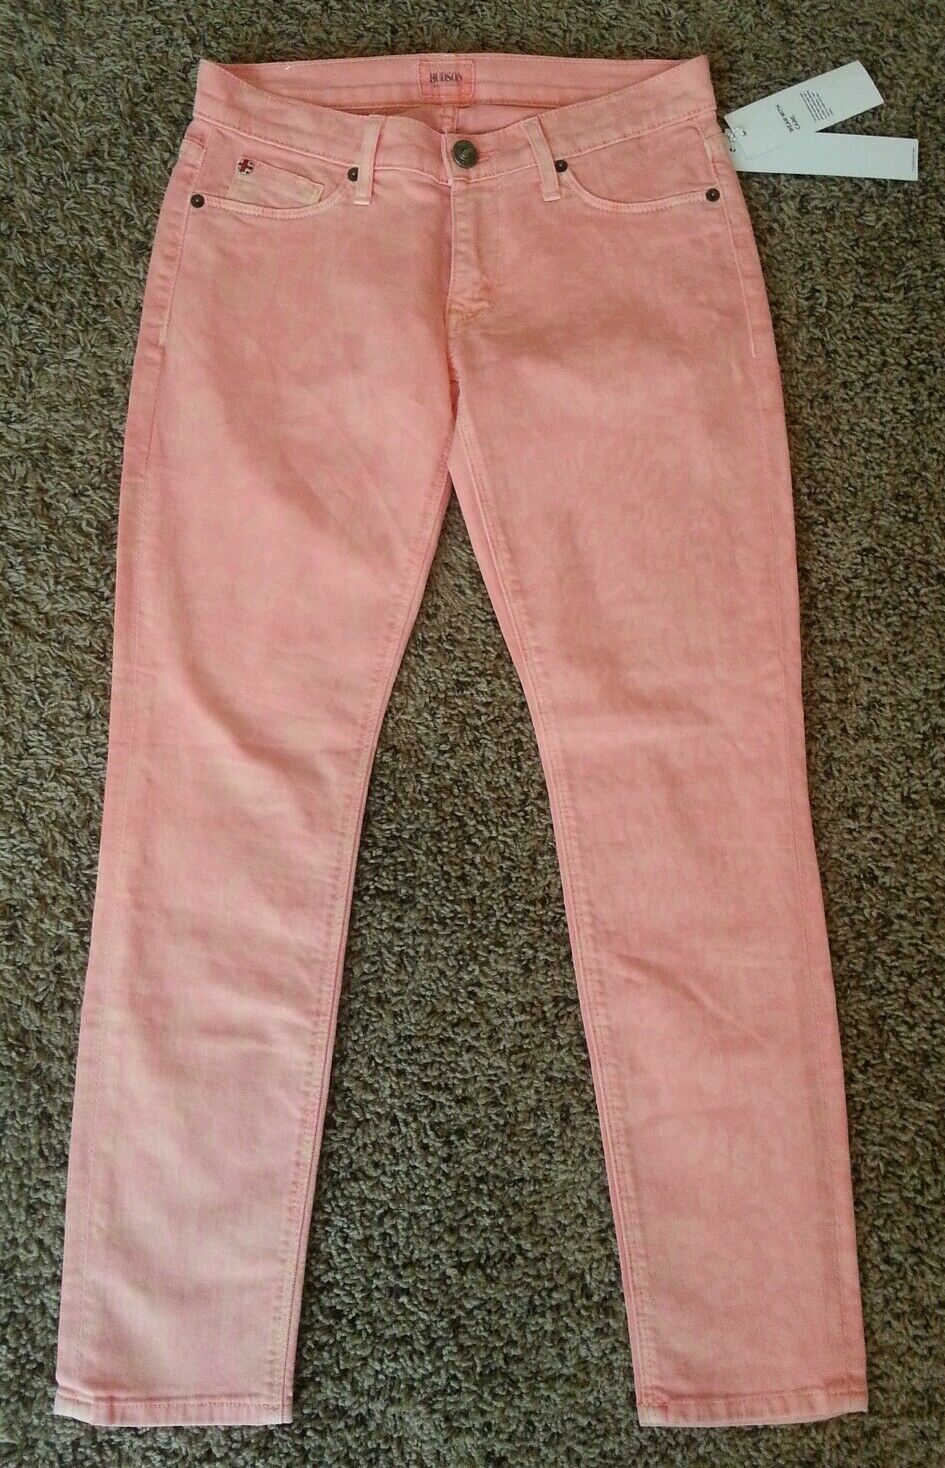 NWT Hudson Krista Crop Super Skinny Peal Pink Animal Print Jeans 25